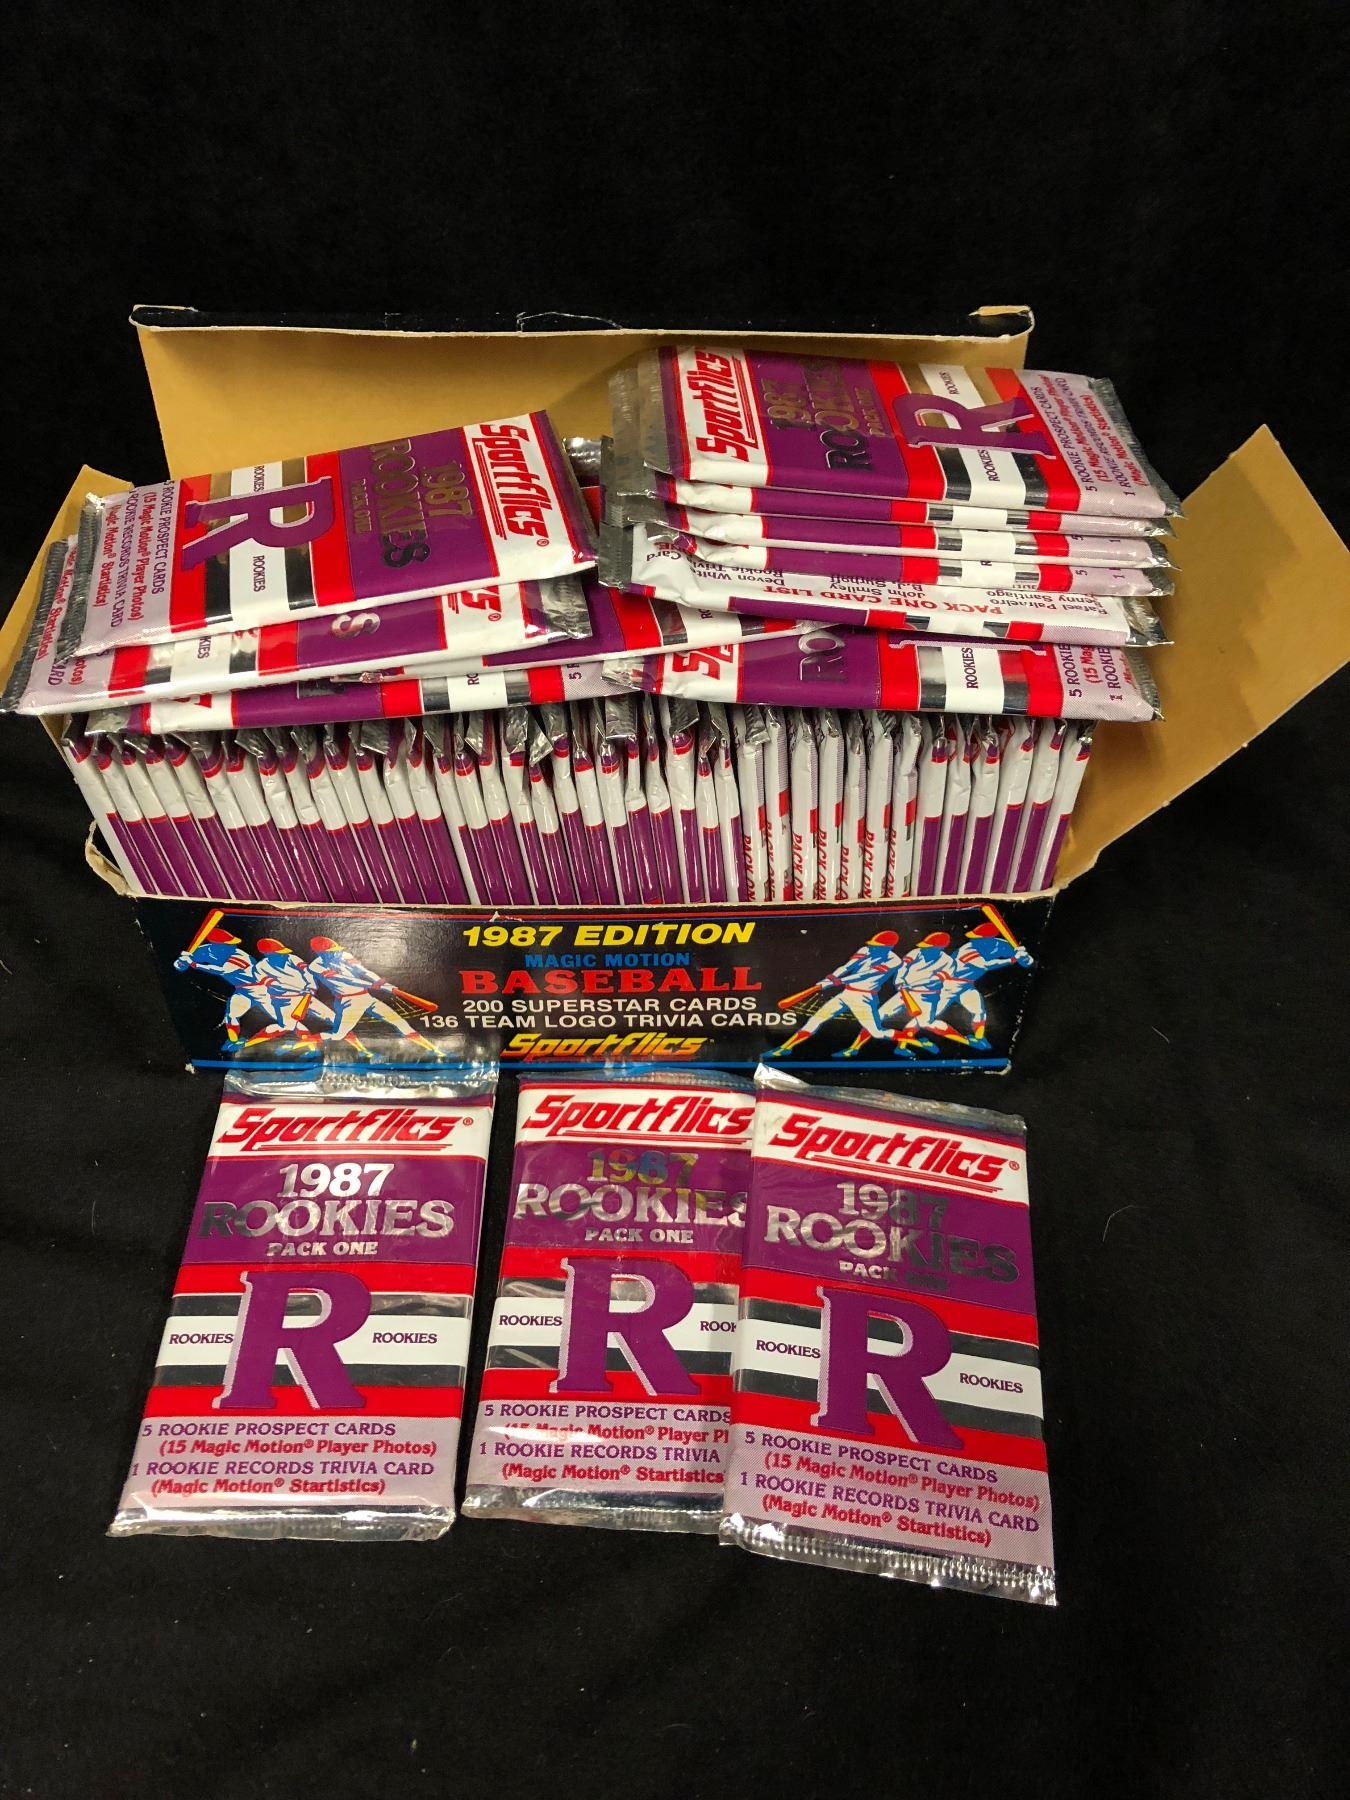 Factory Sealed 1987 Sportflics Baseball Rookie Card Packs